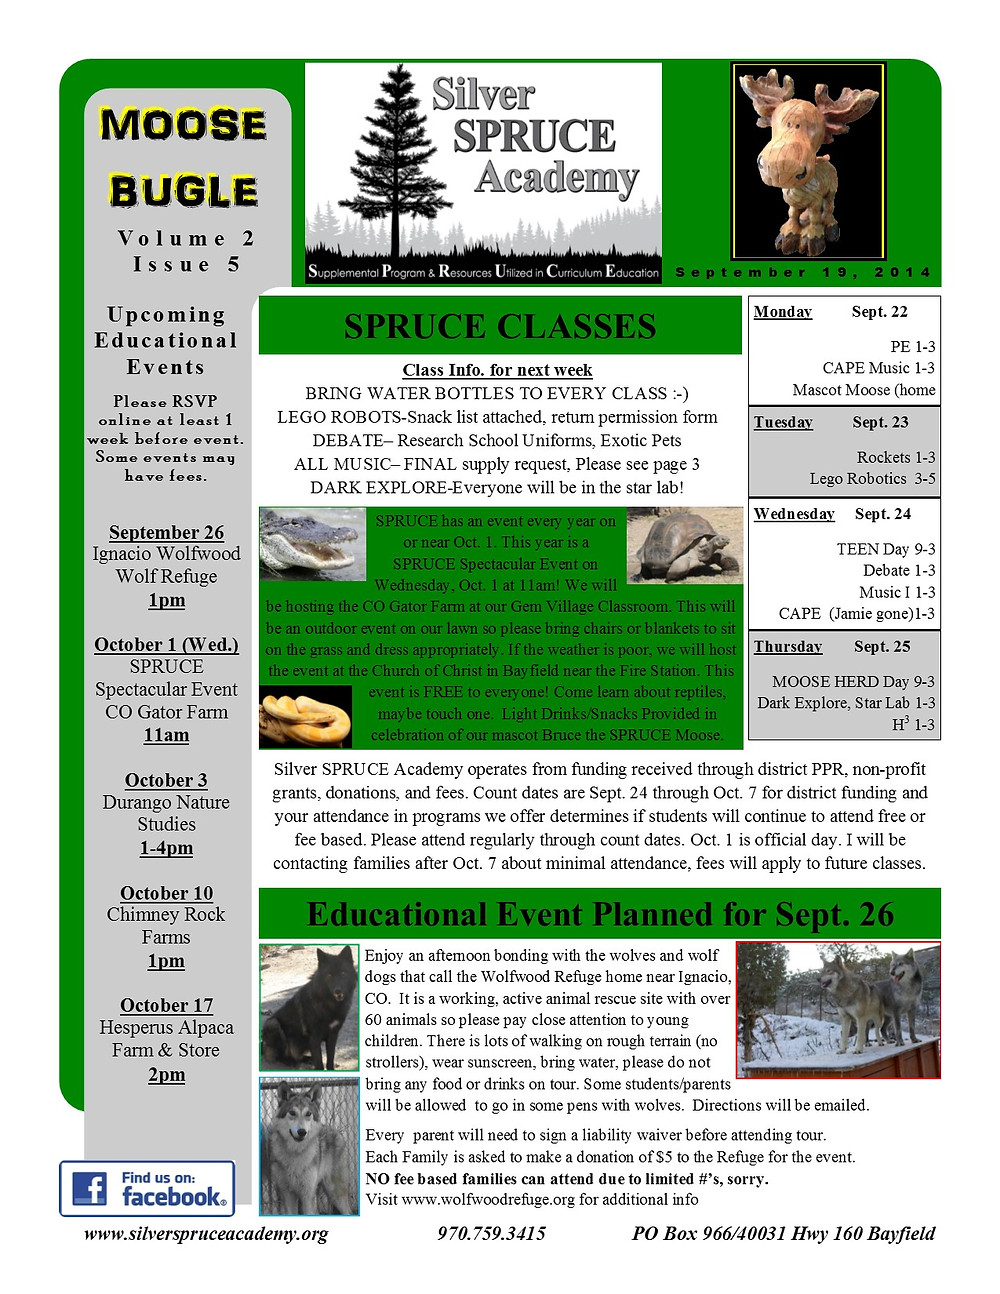 Moose Bugle 9-19-14 Page 1.jpg